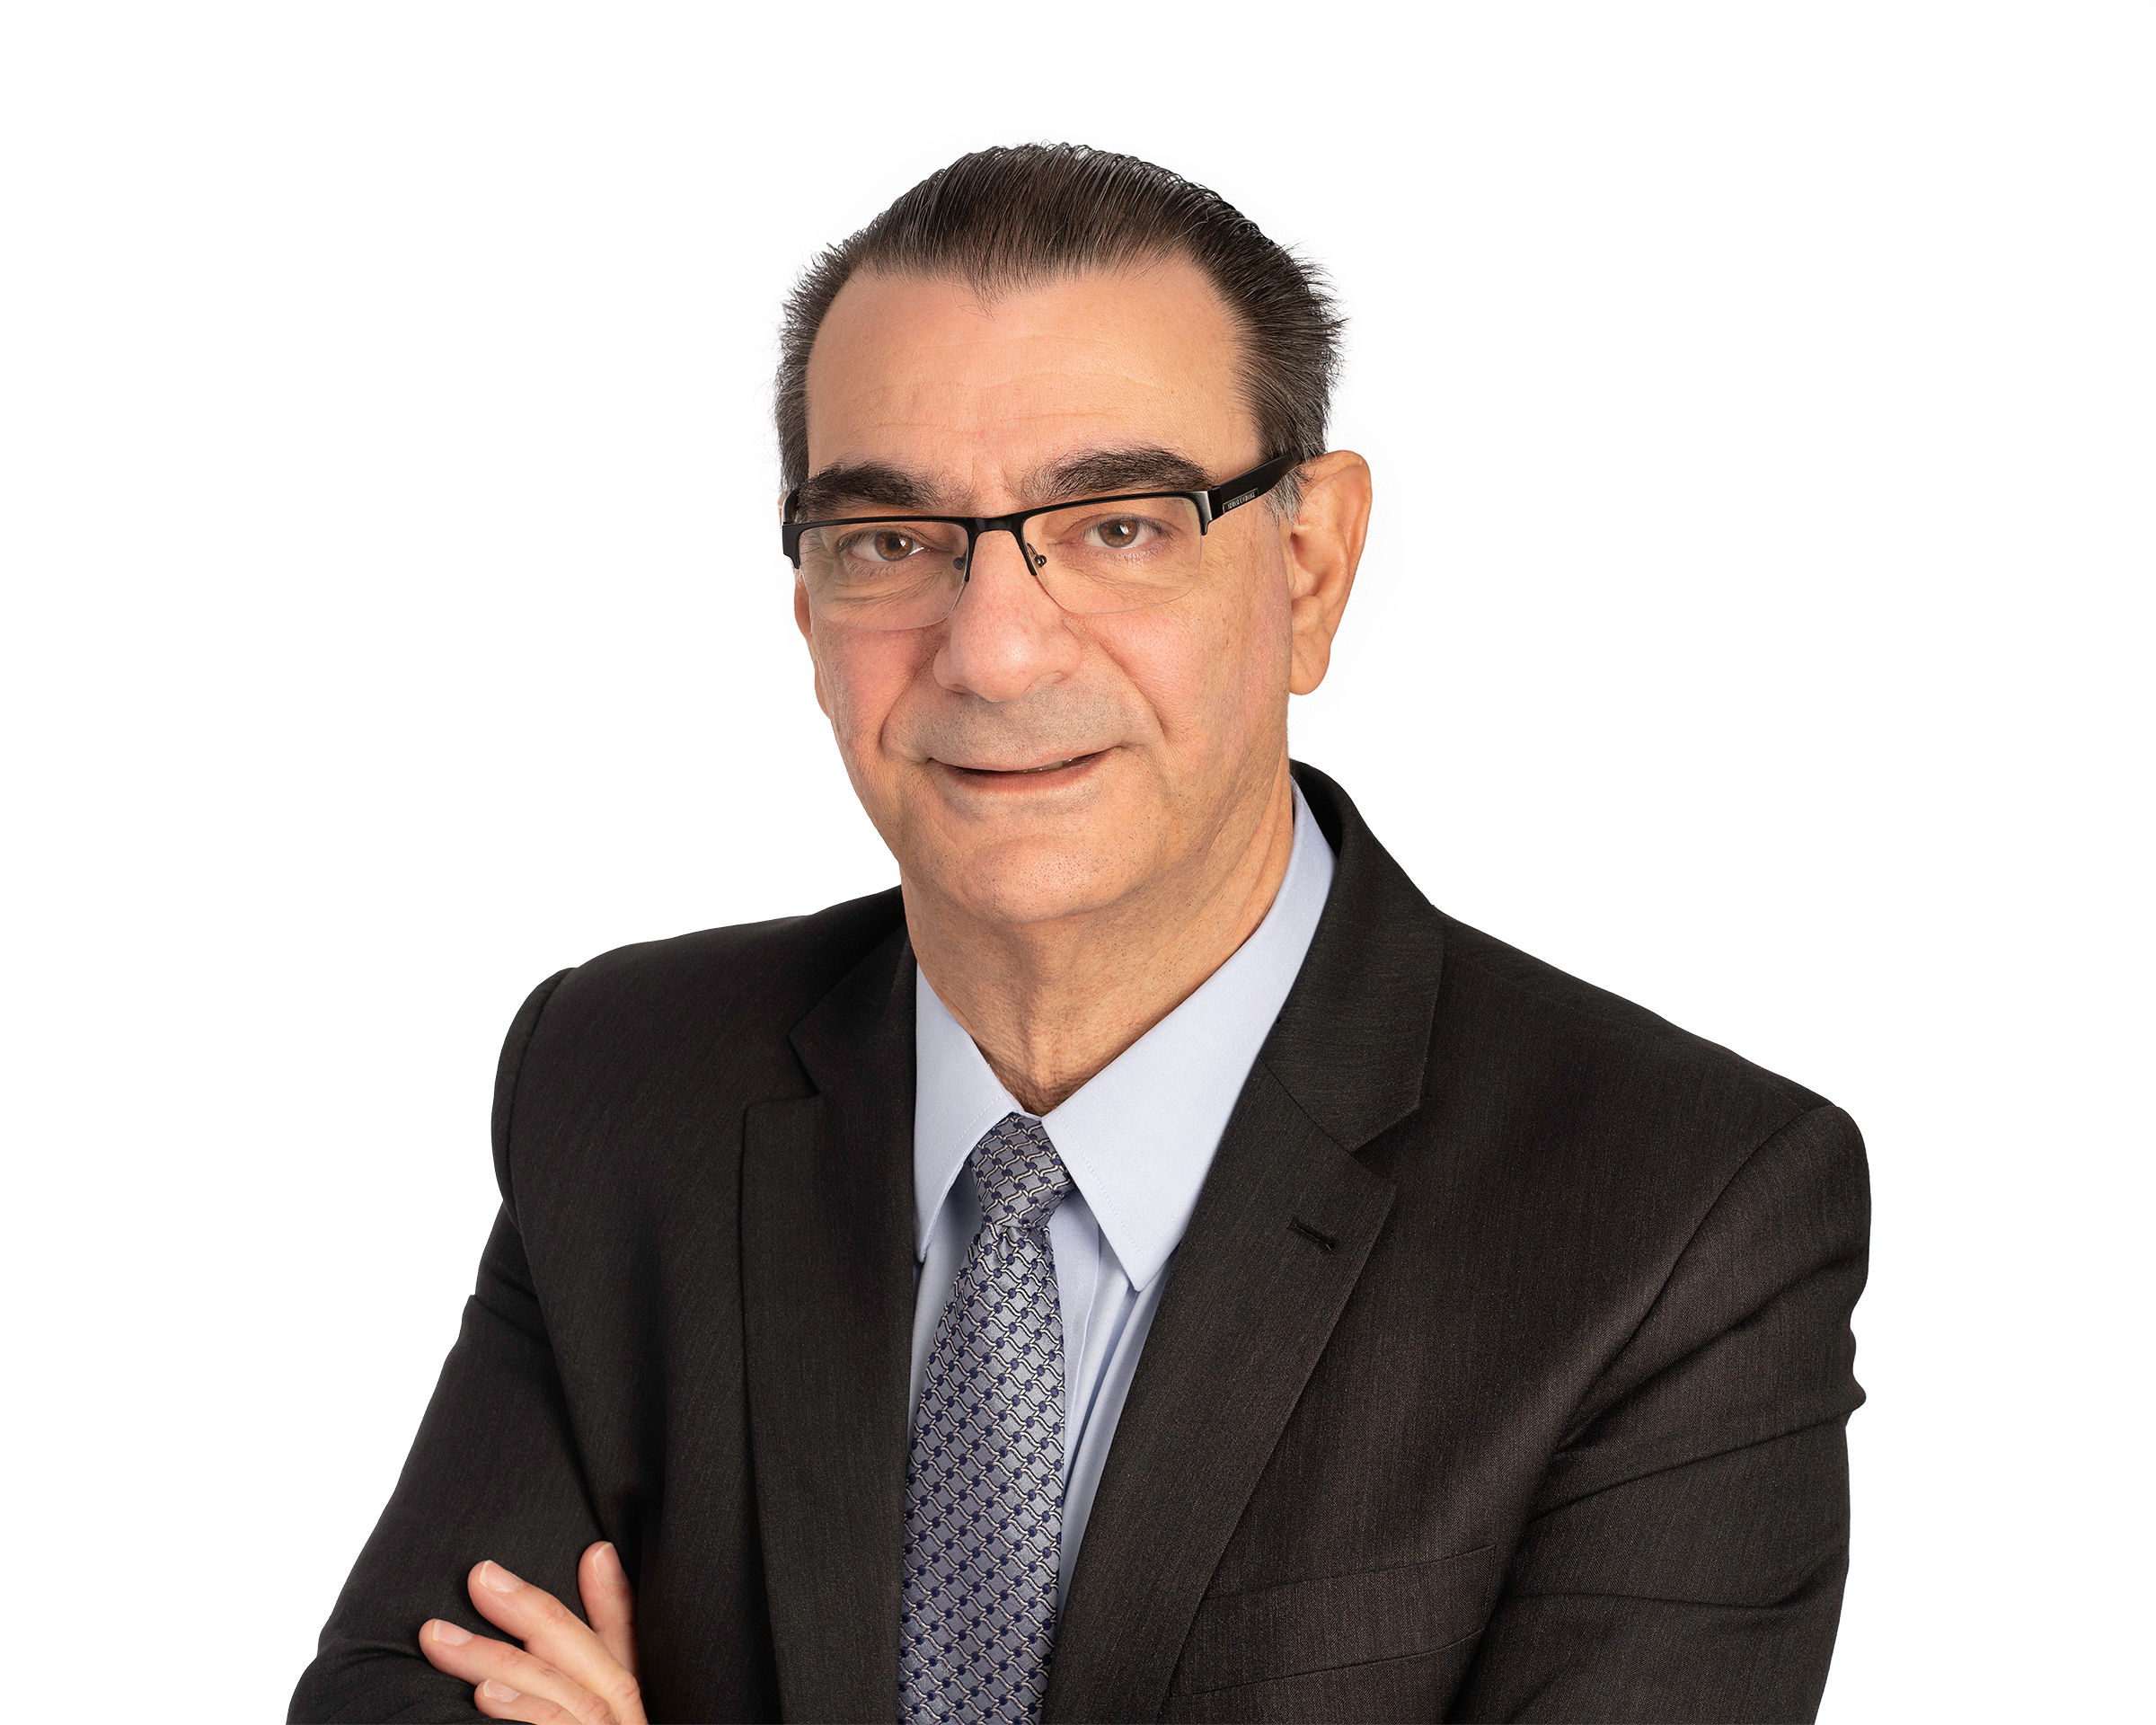 Tadeu Carneiro